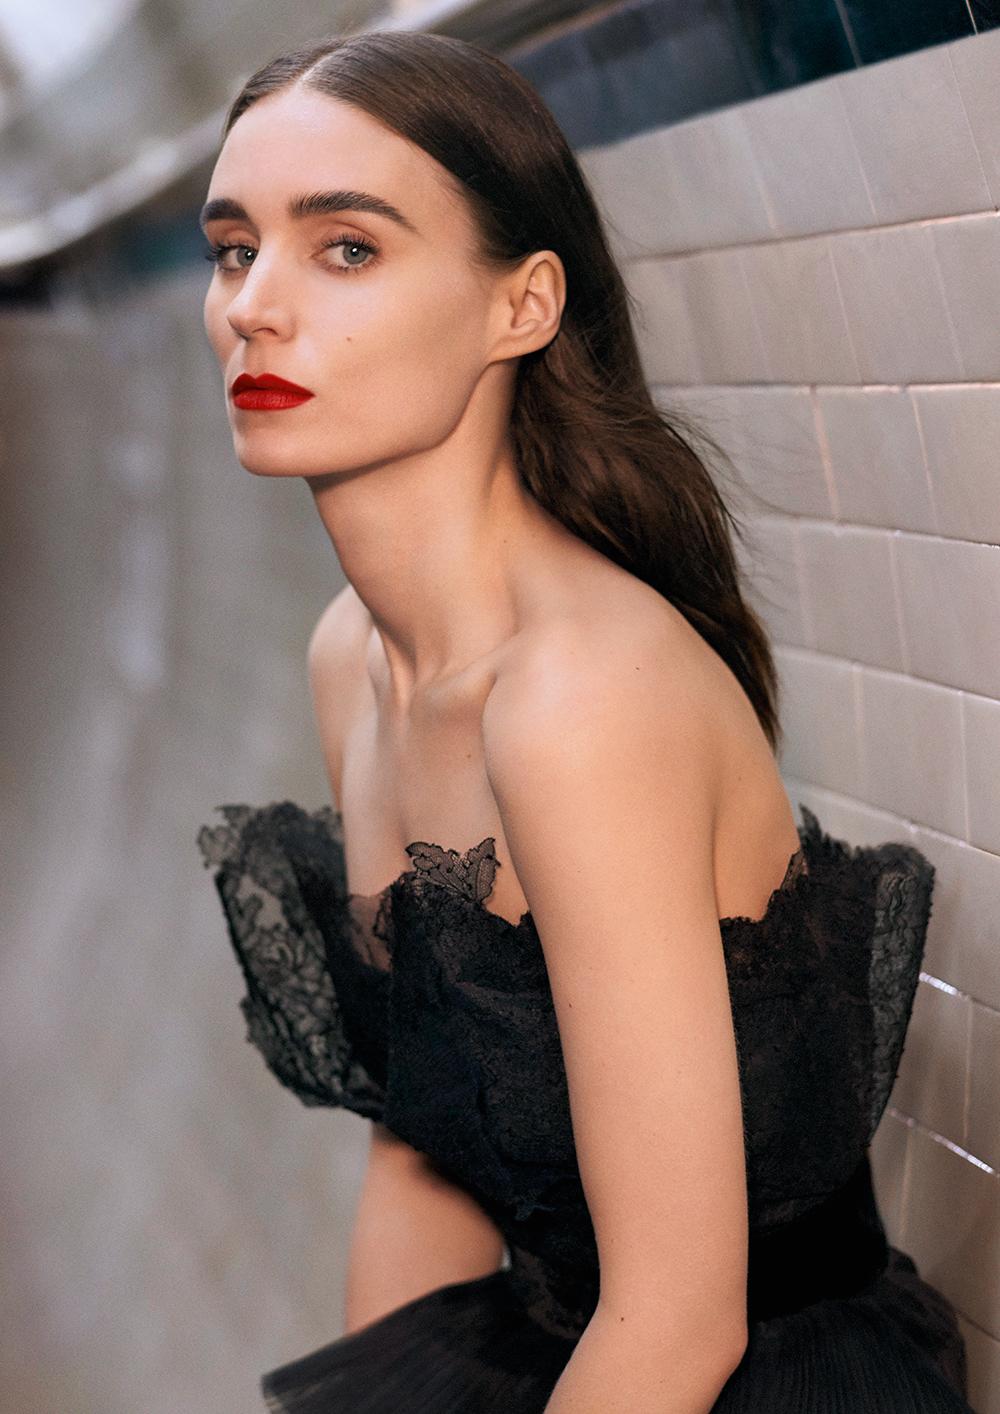 Givenchy Beauty lanseres i Norge